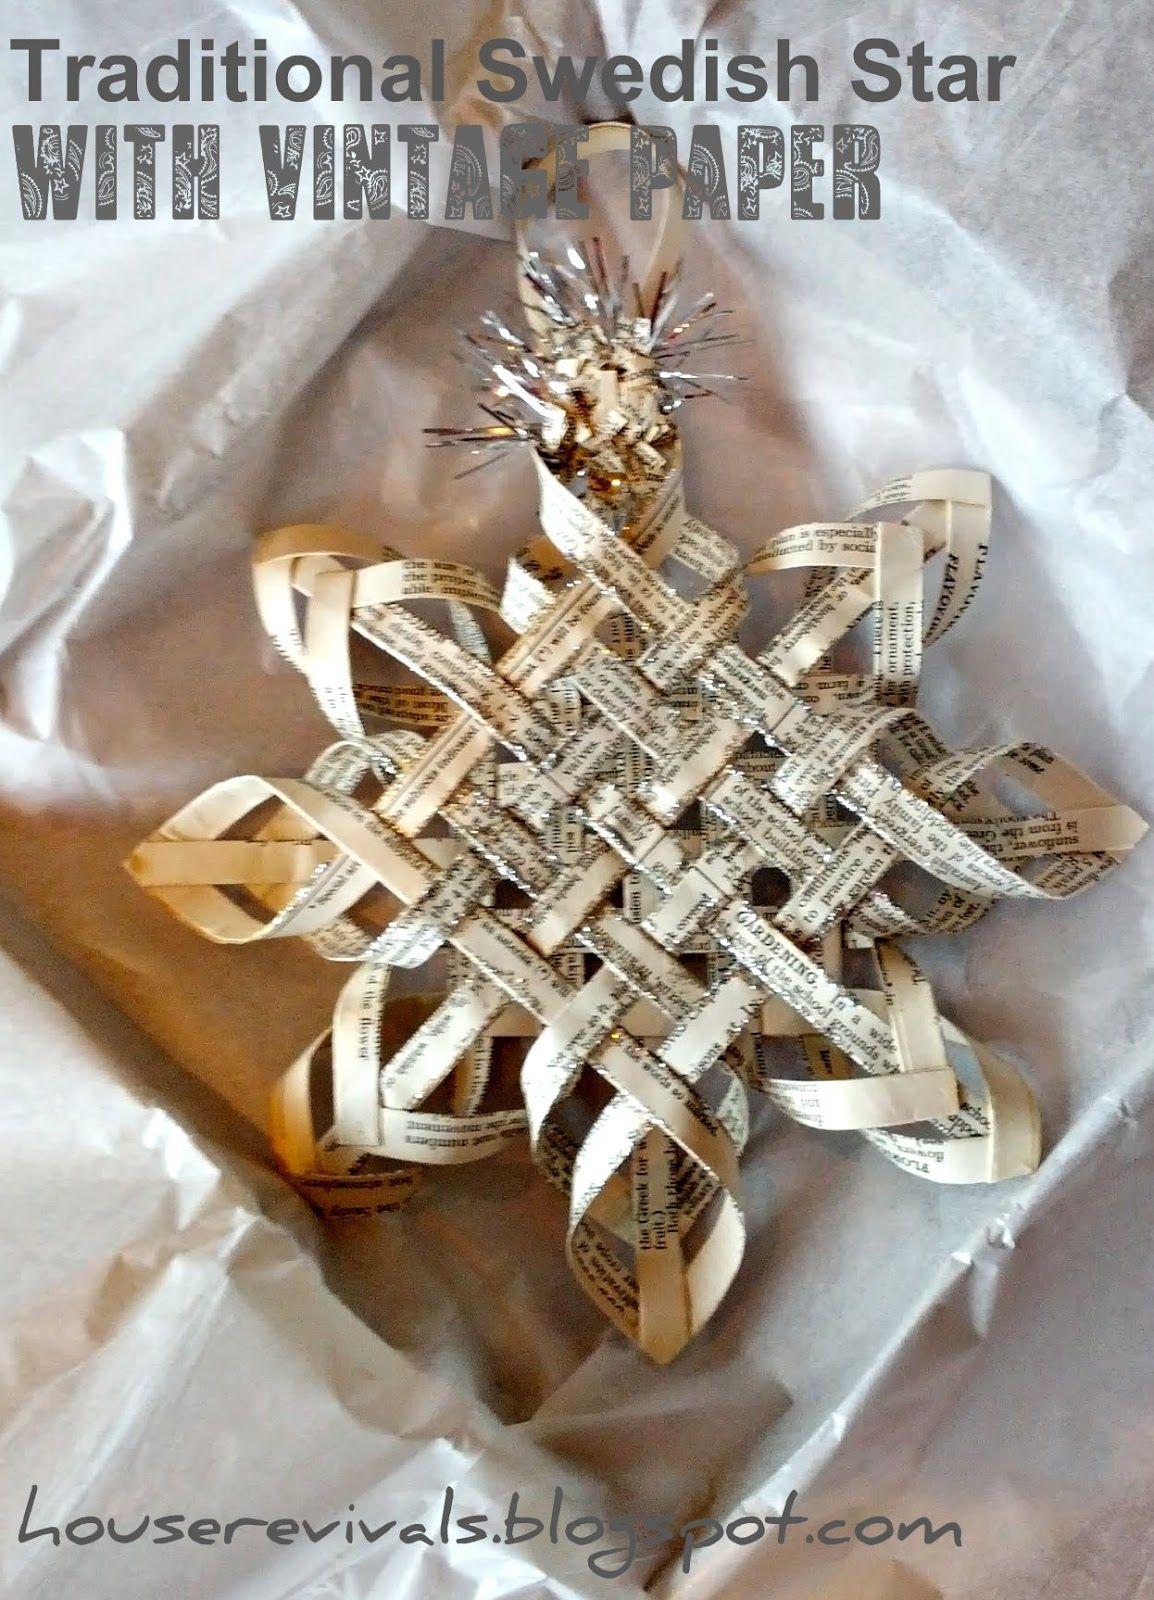 House Revivals Traditional Scandinavian Woven Star Christmas Ornaments Christmas Diy Xmas Crafts